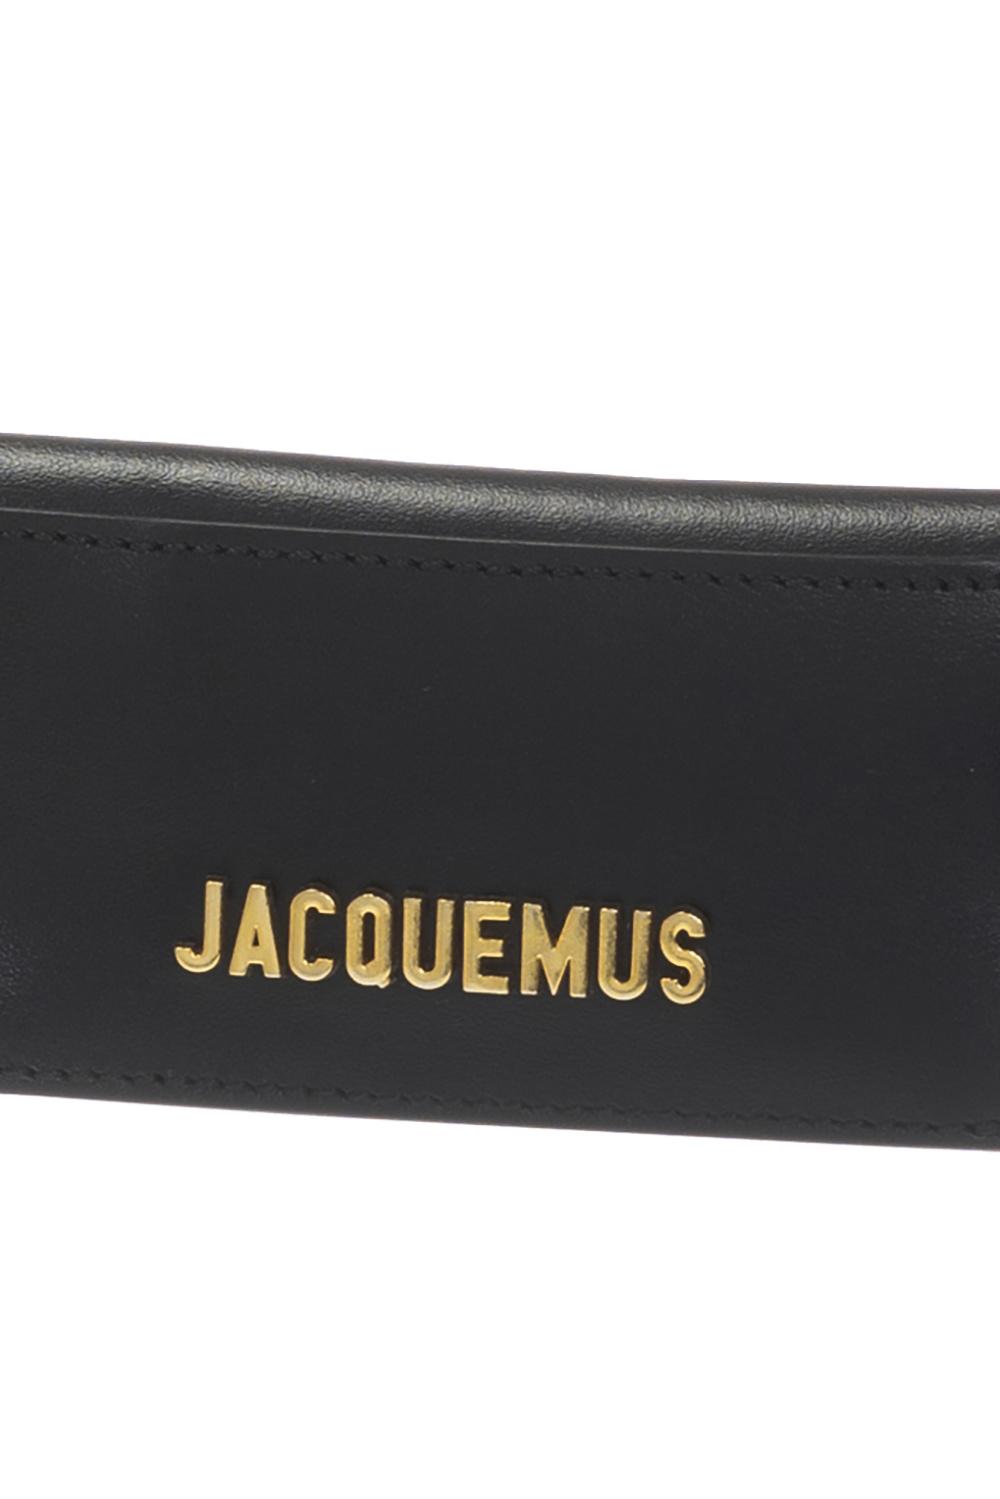 Jacquemus Belt with logo